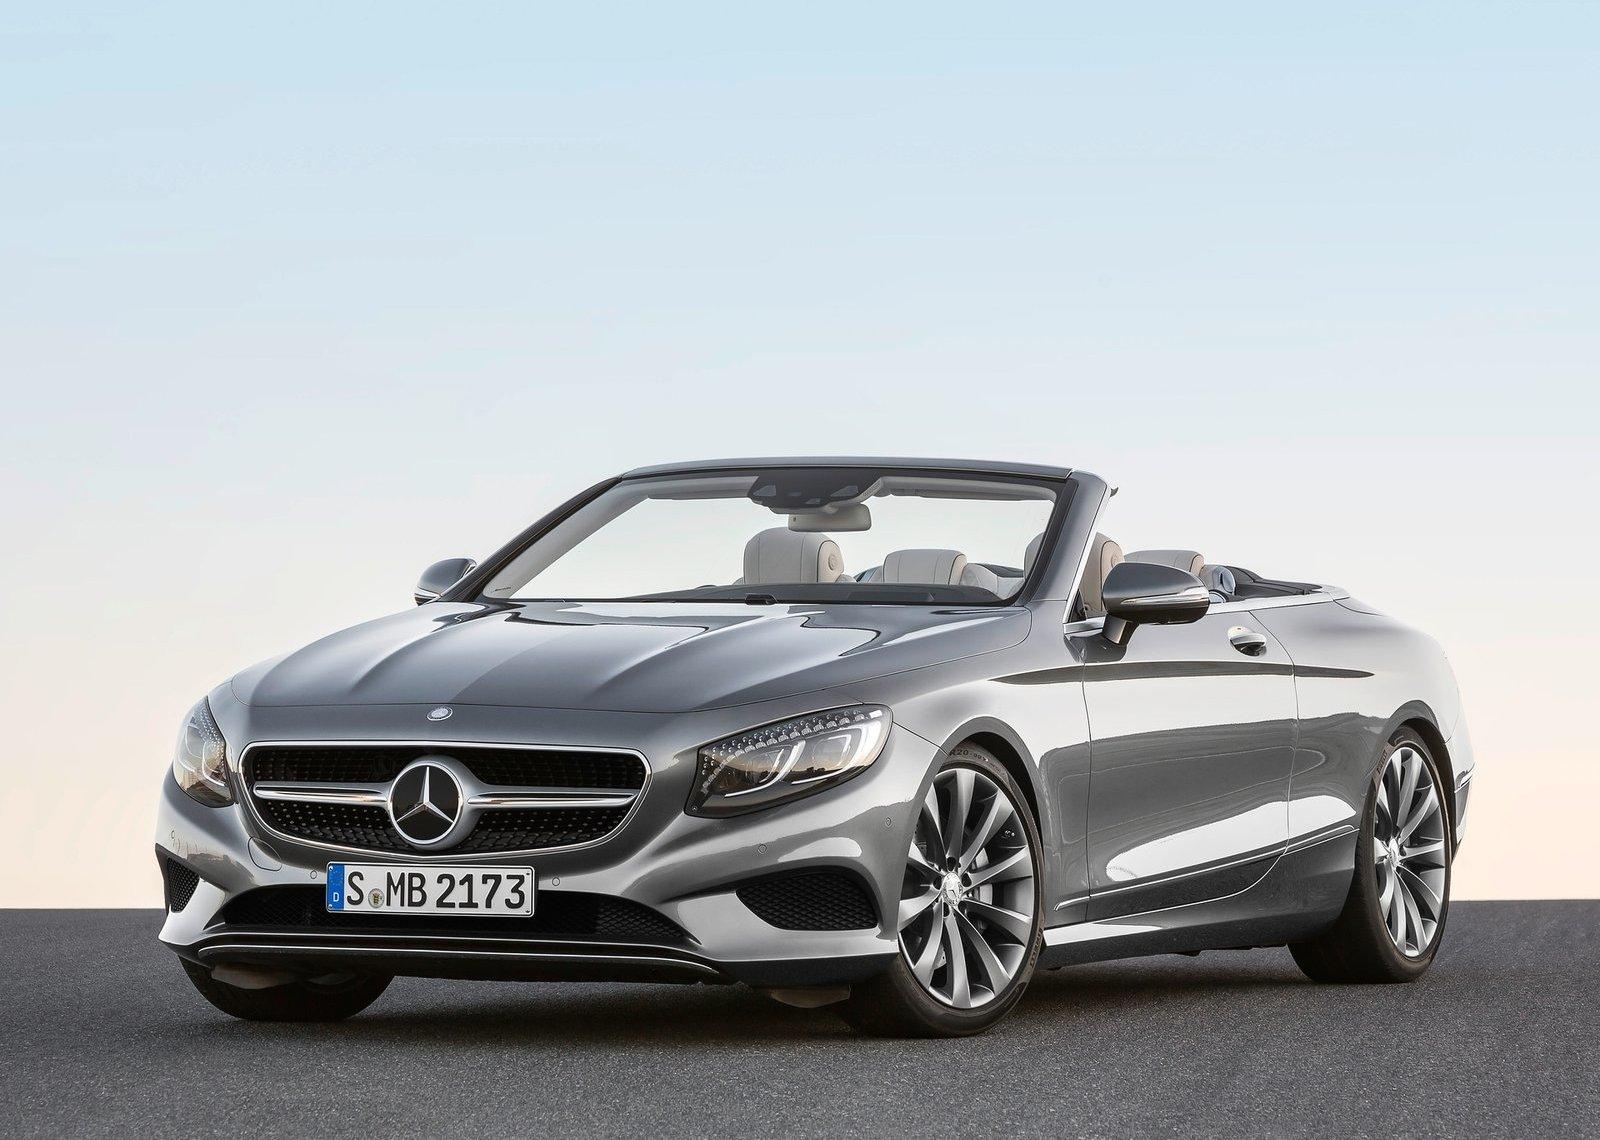 Mercedes benz clase s cabriolet el colosal descapotable for Mercedes benz original